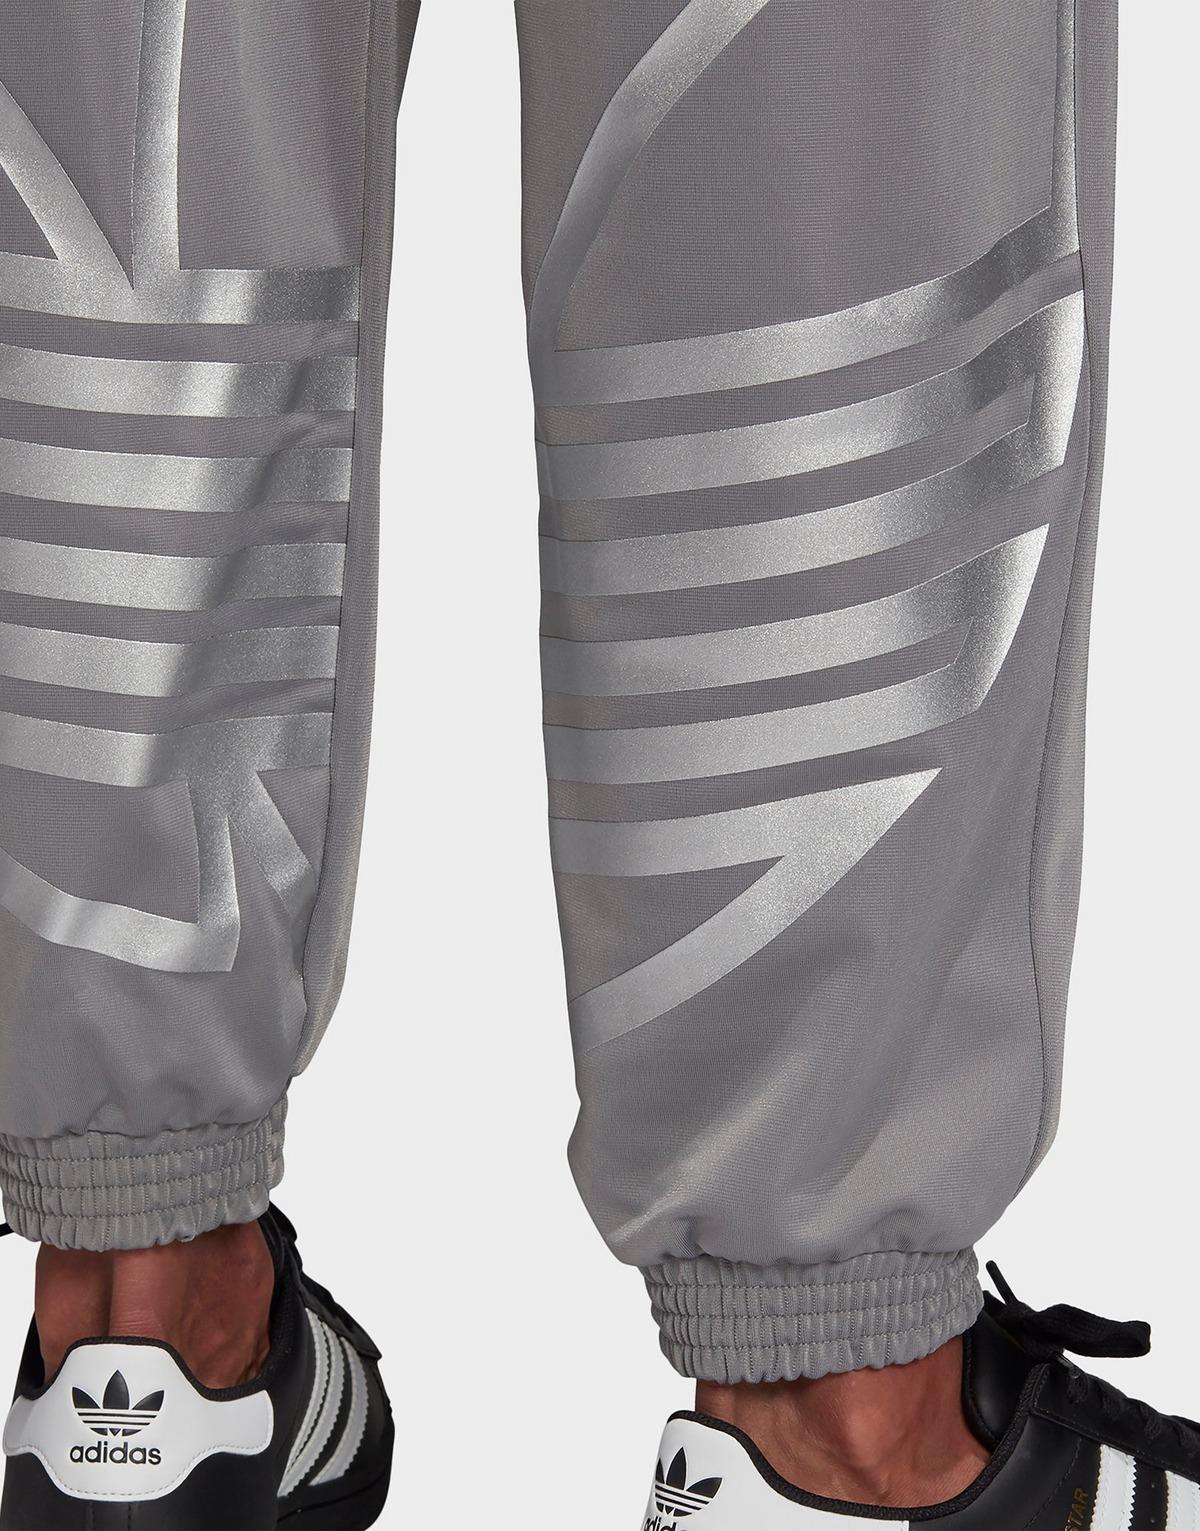 Adidas Originals Metallic Tracksuit Bottoms